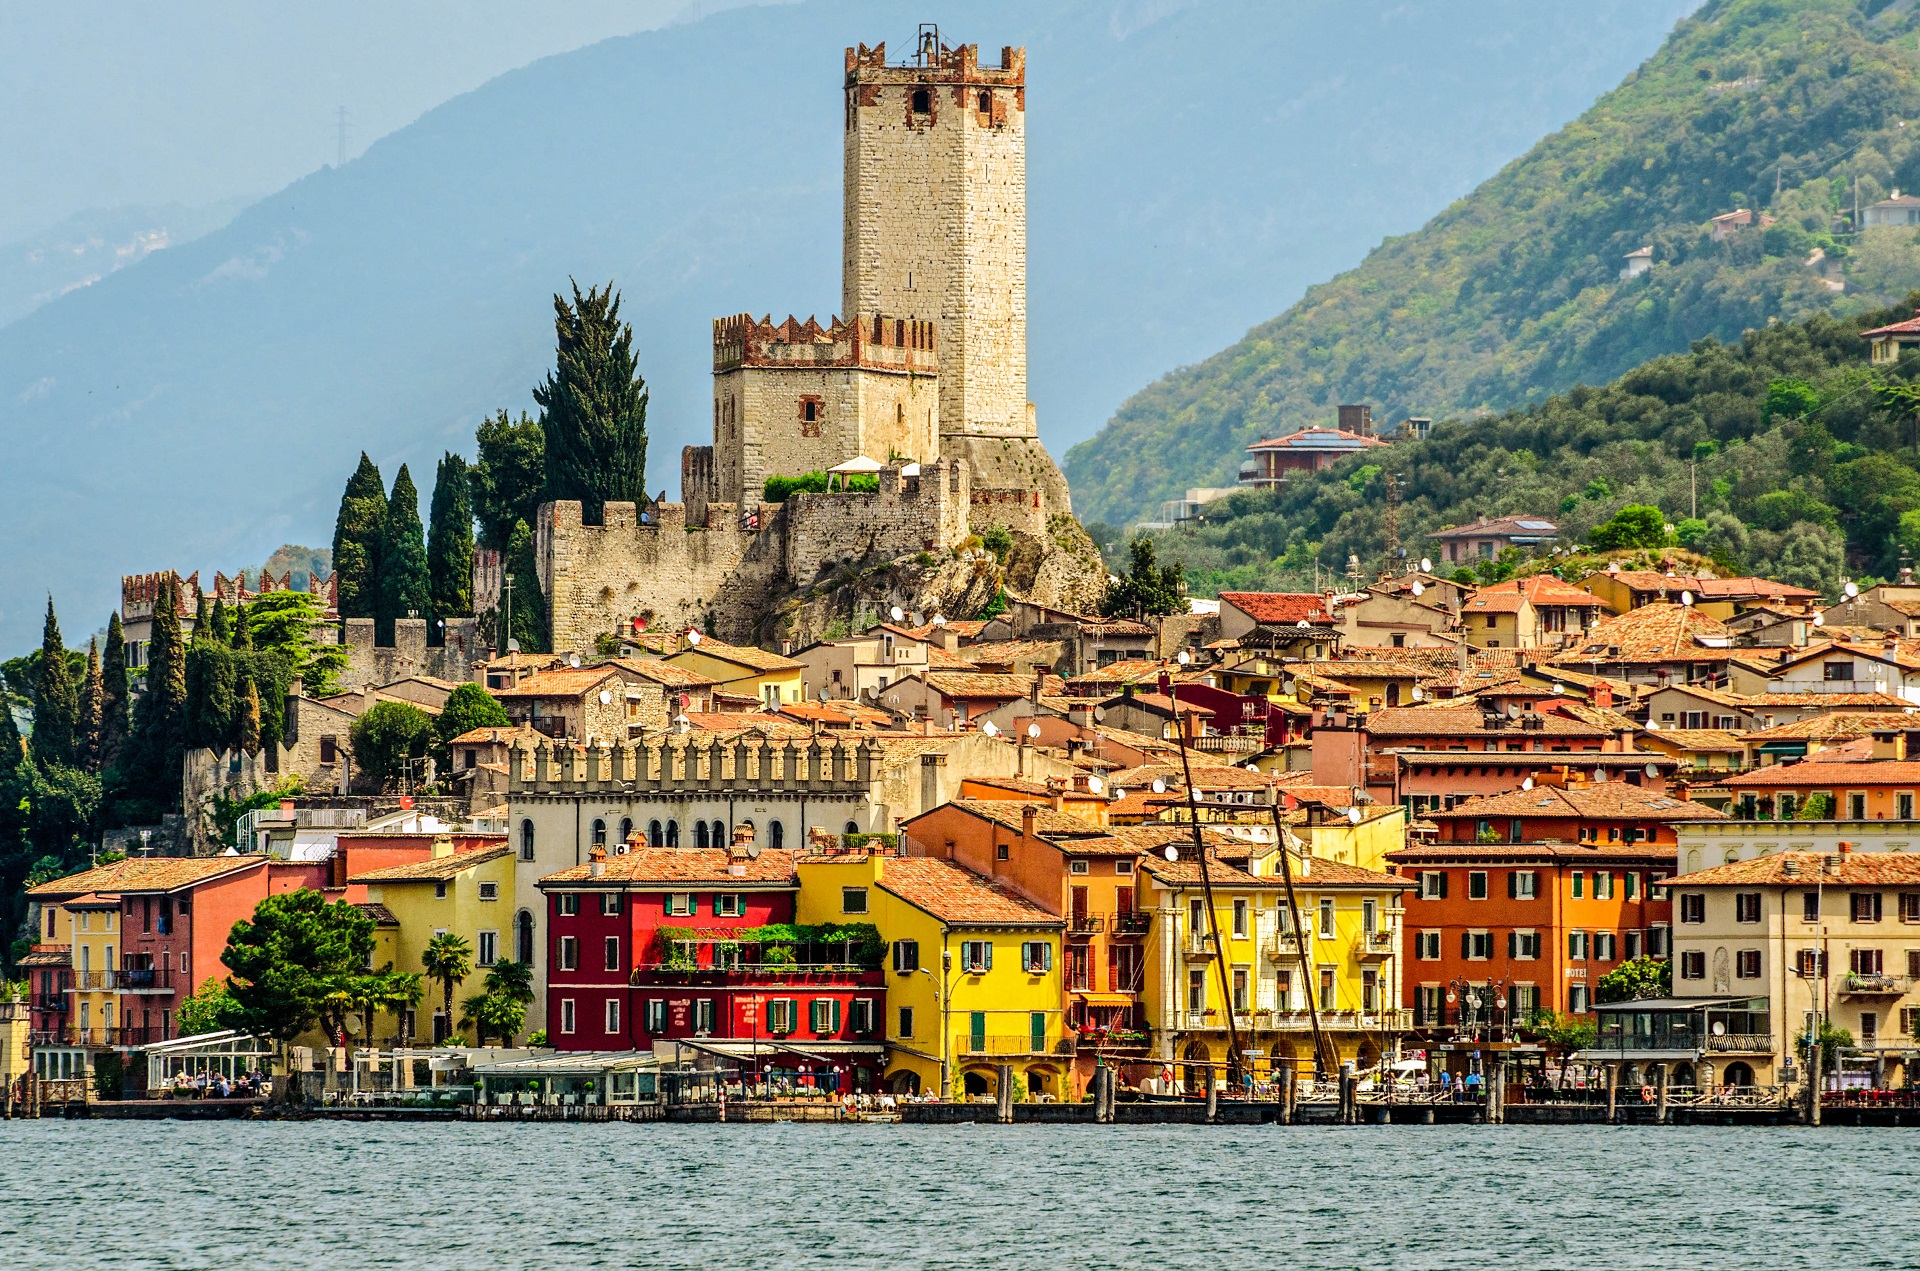 Hotel San Marco Lake Garda